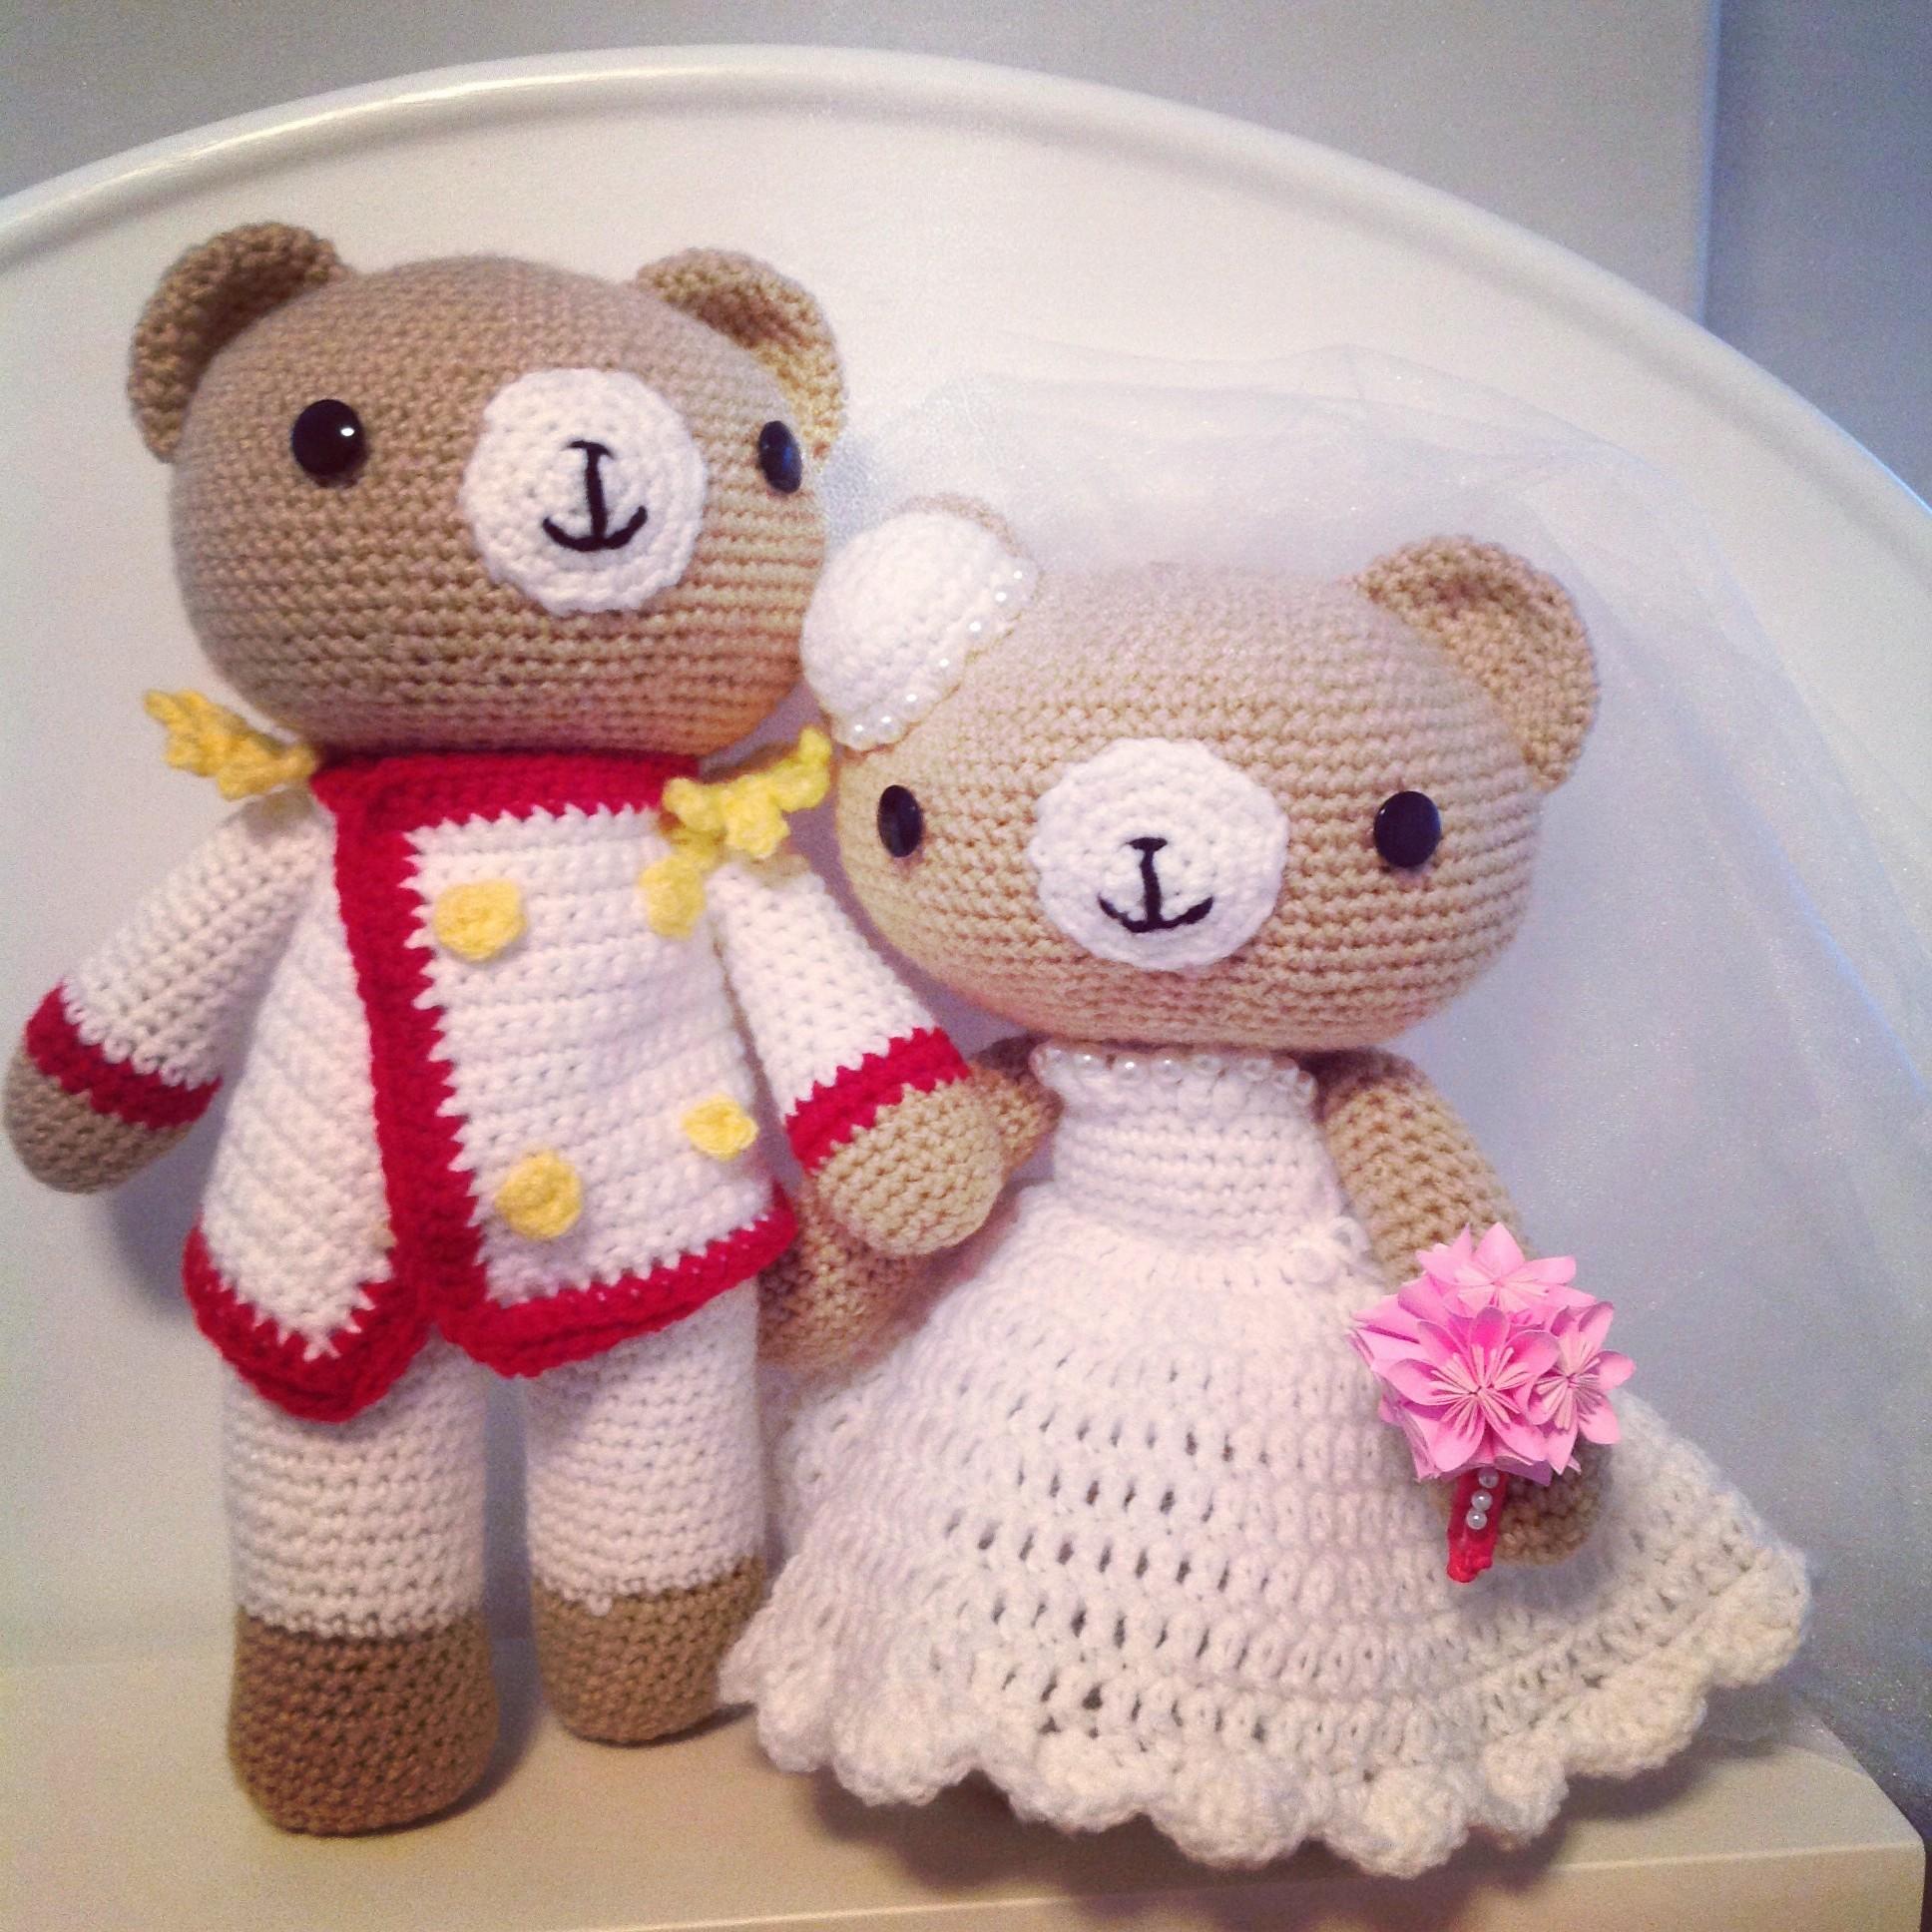 Free Amigurumi Patterns Owls : Pattern Crochet Wedding Bear Couple 2KidslandKrafts